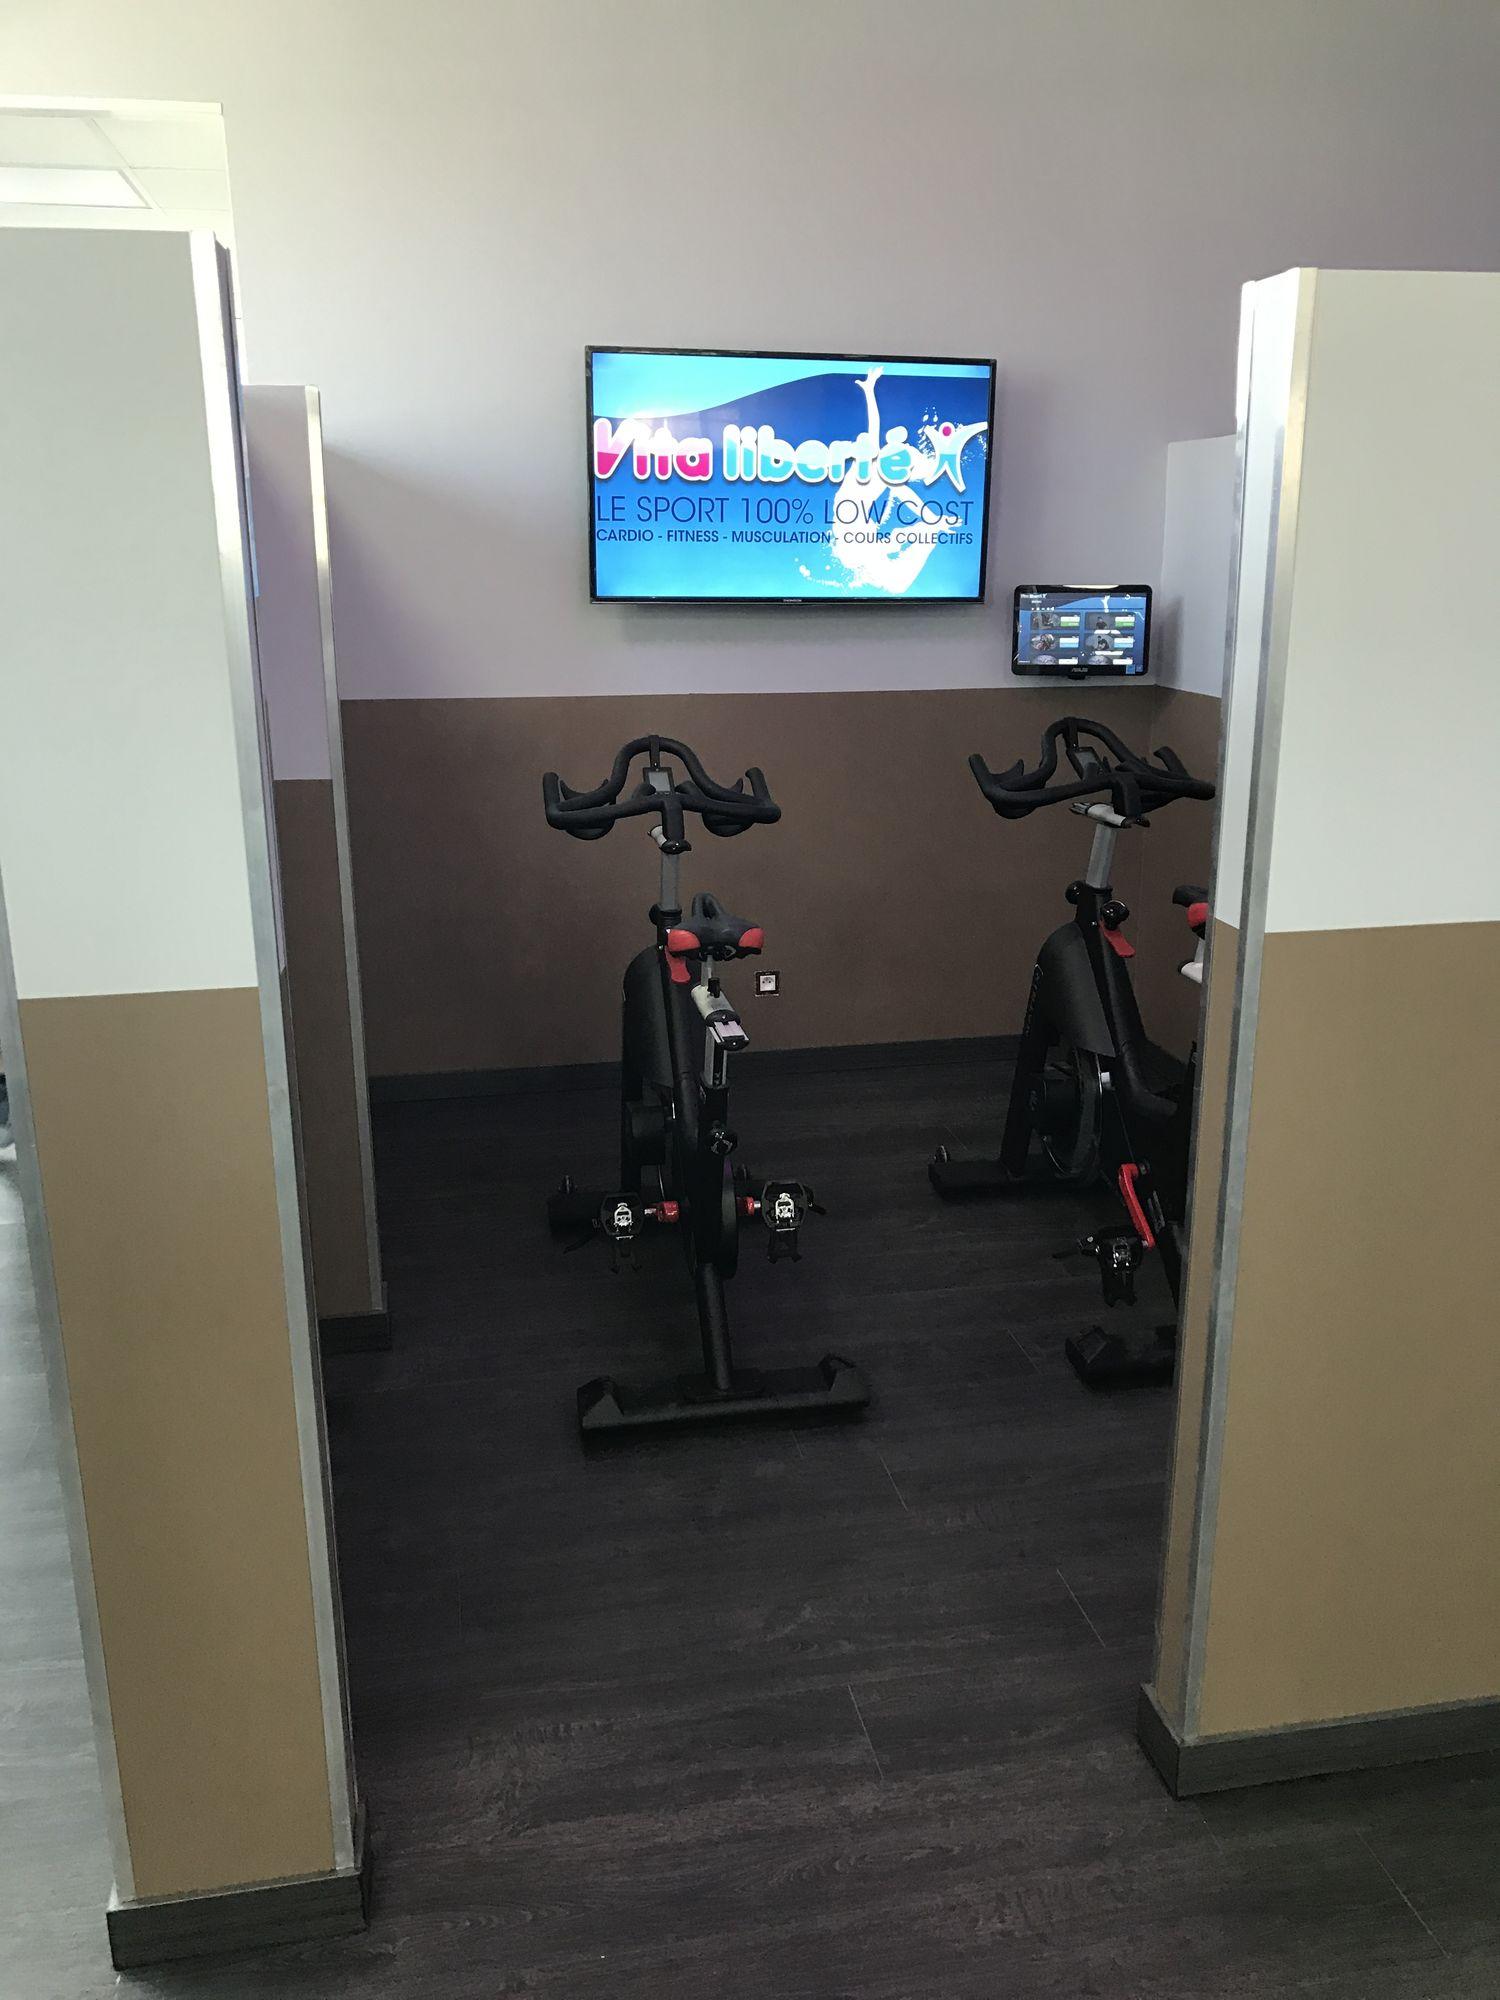 Salle de sport Vita liberté Castres bike 2